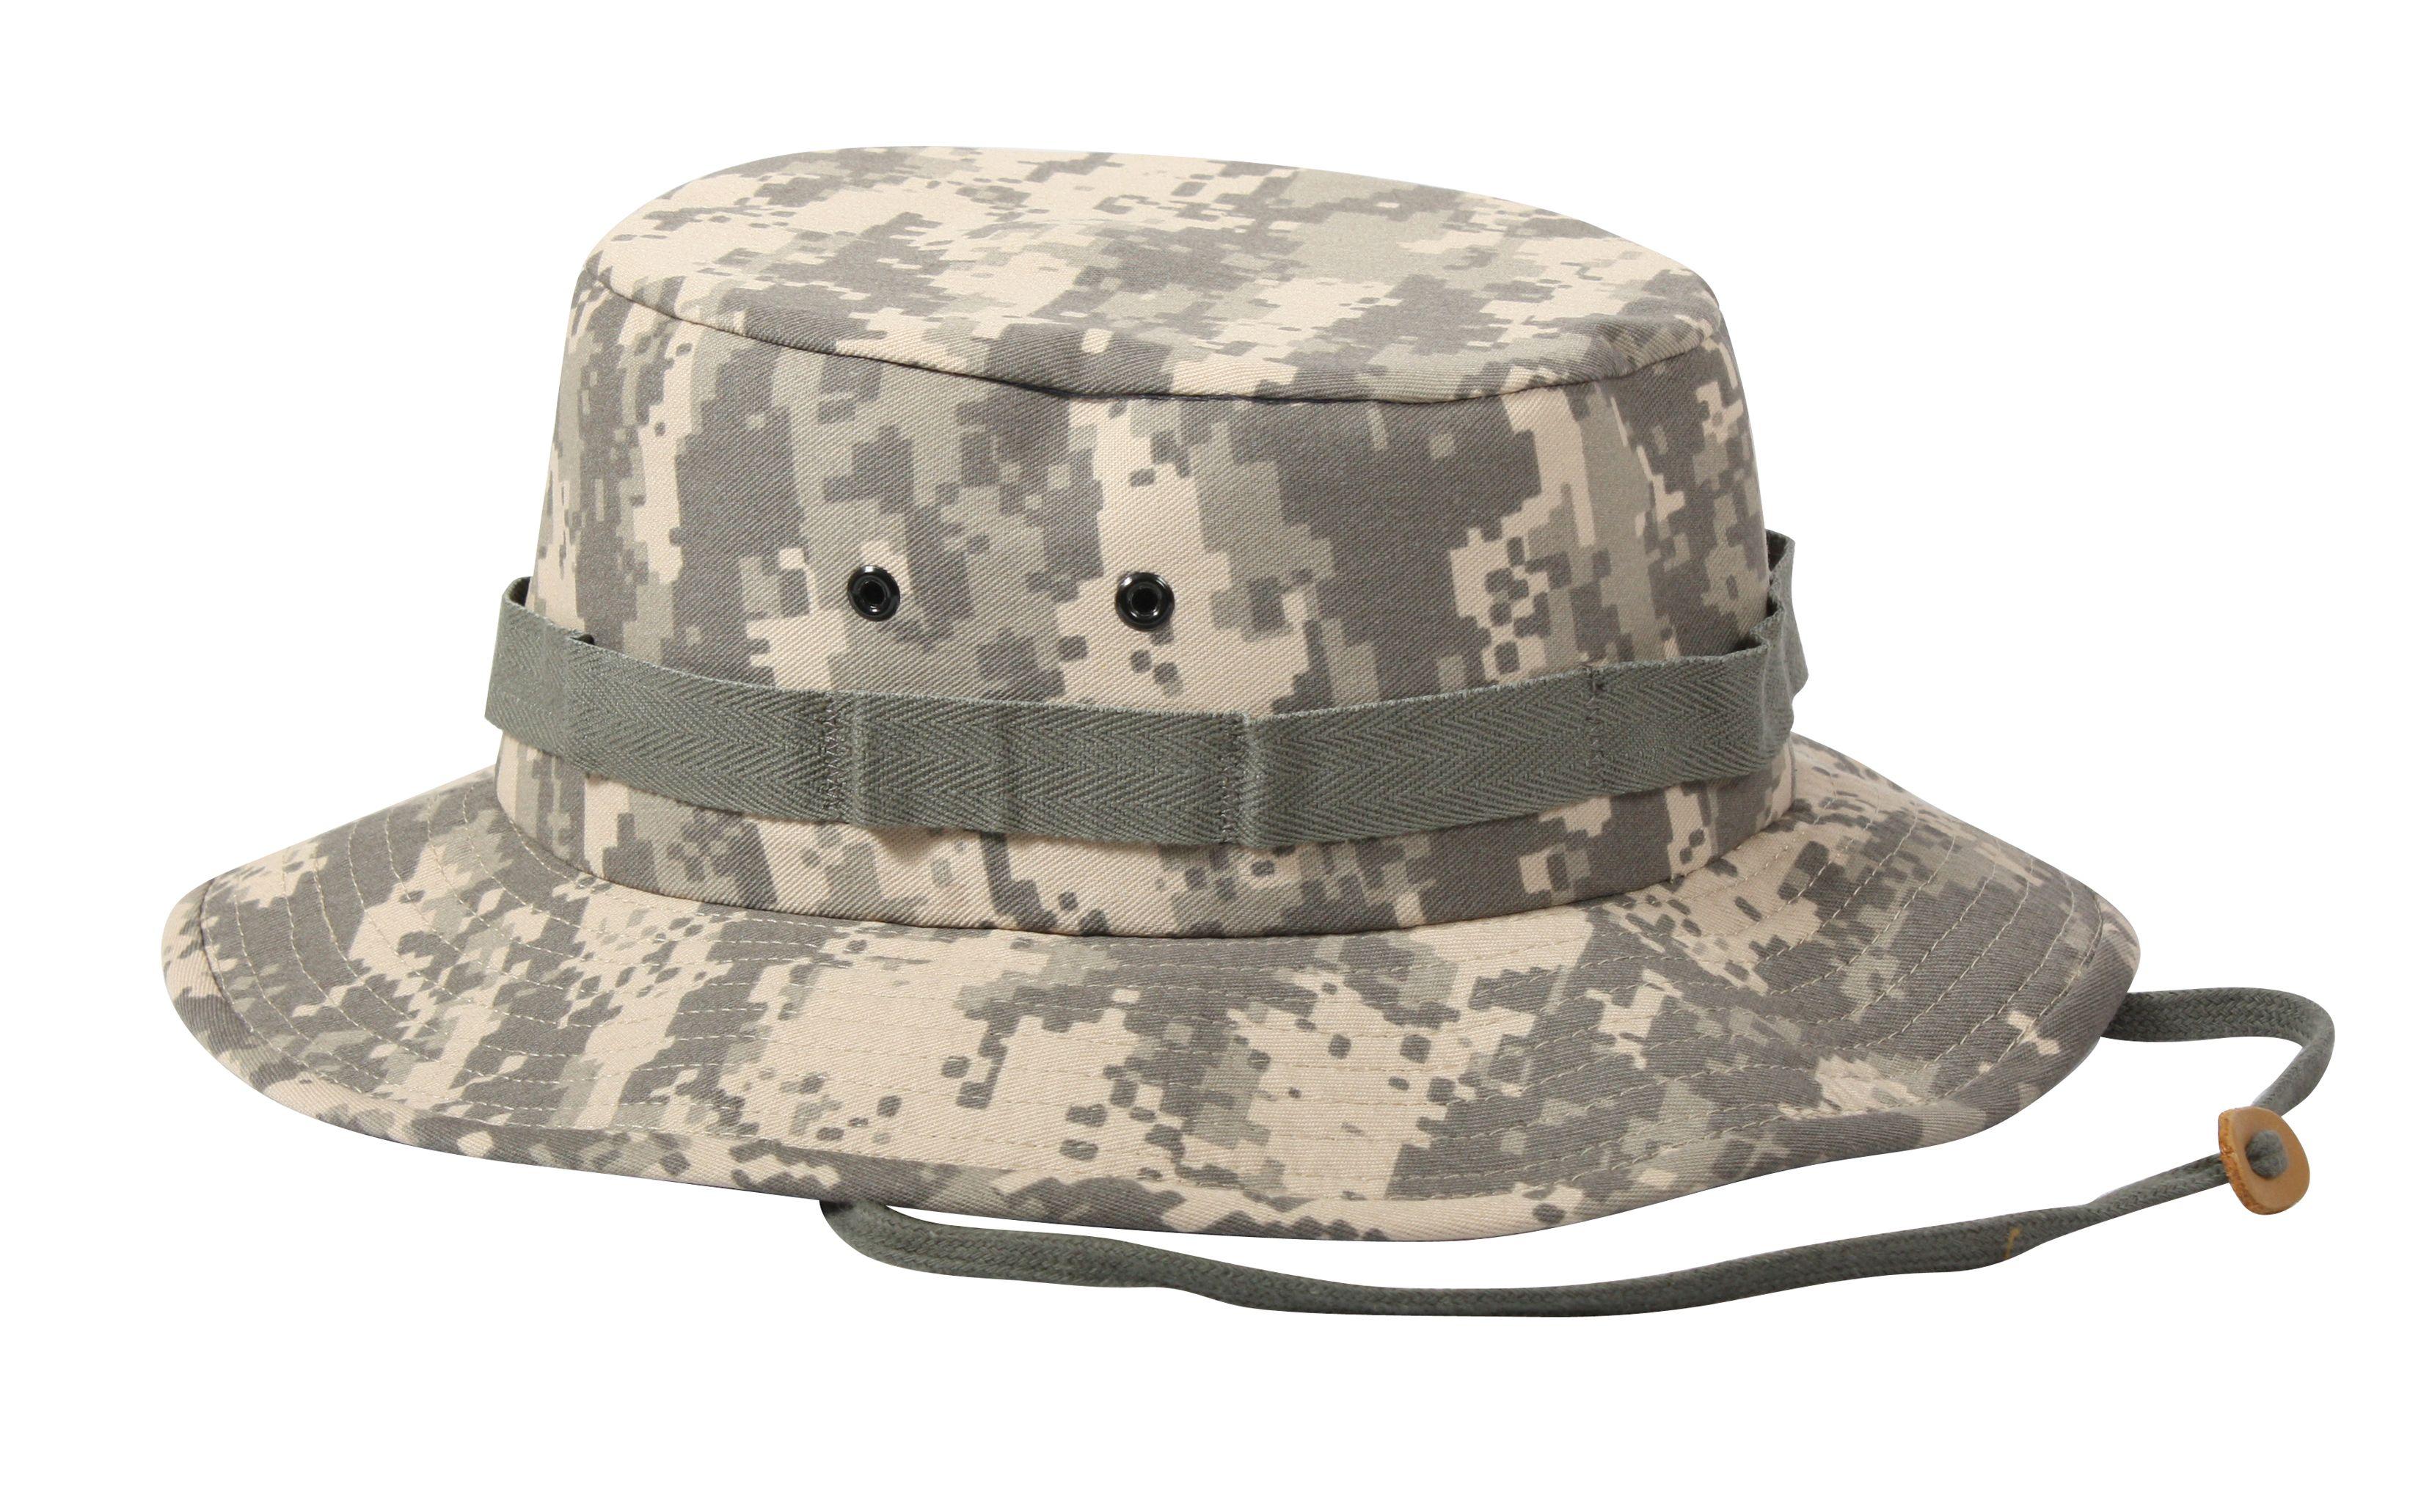 c9c23fed708cd Rothco ACU Digital Camo Jungle Hat